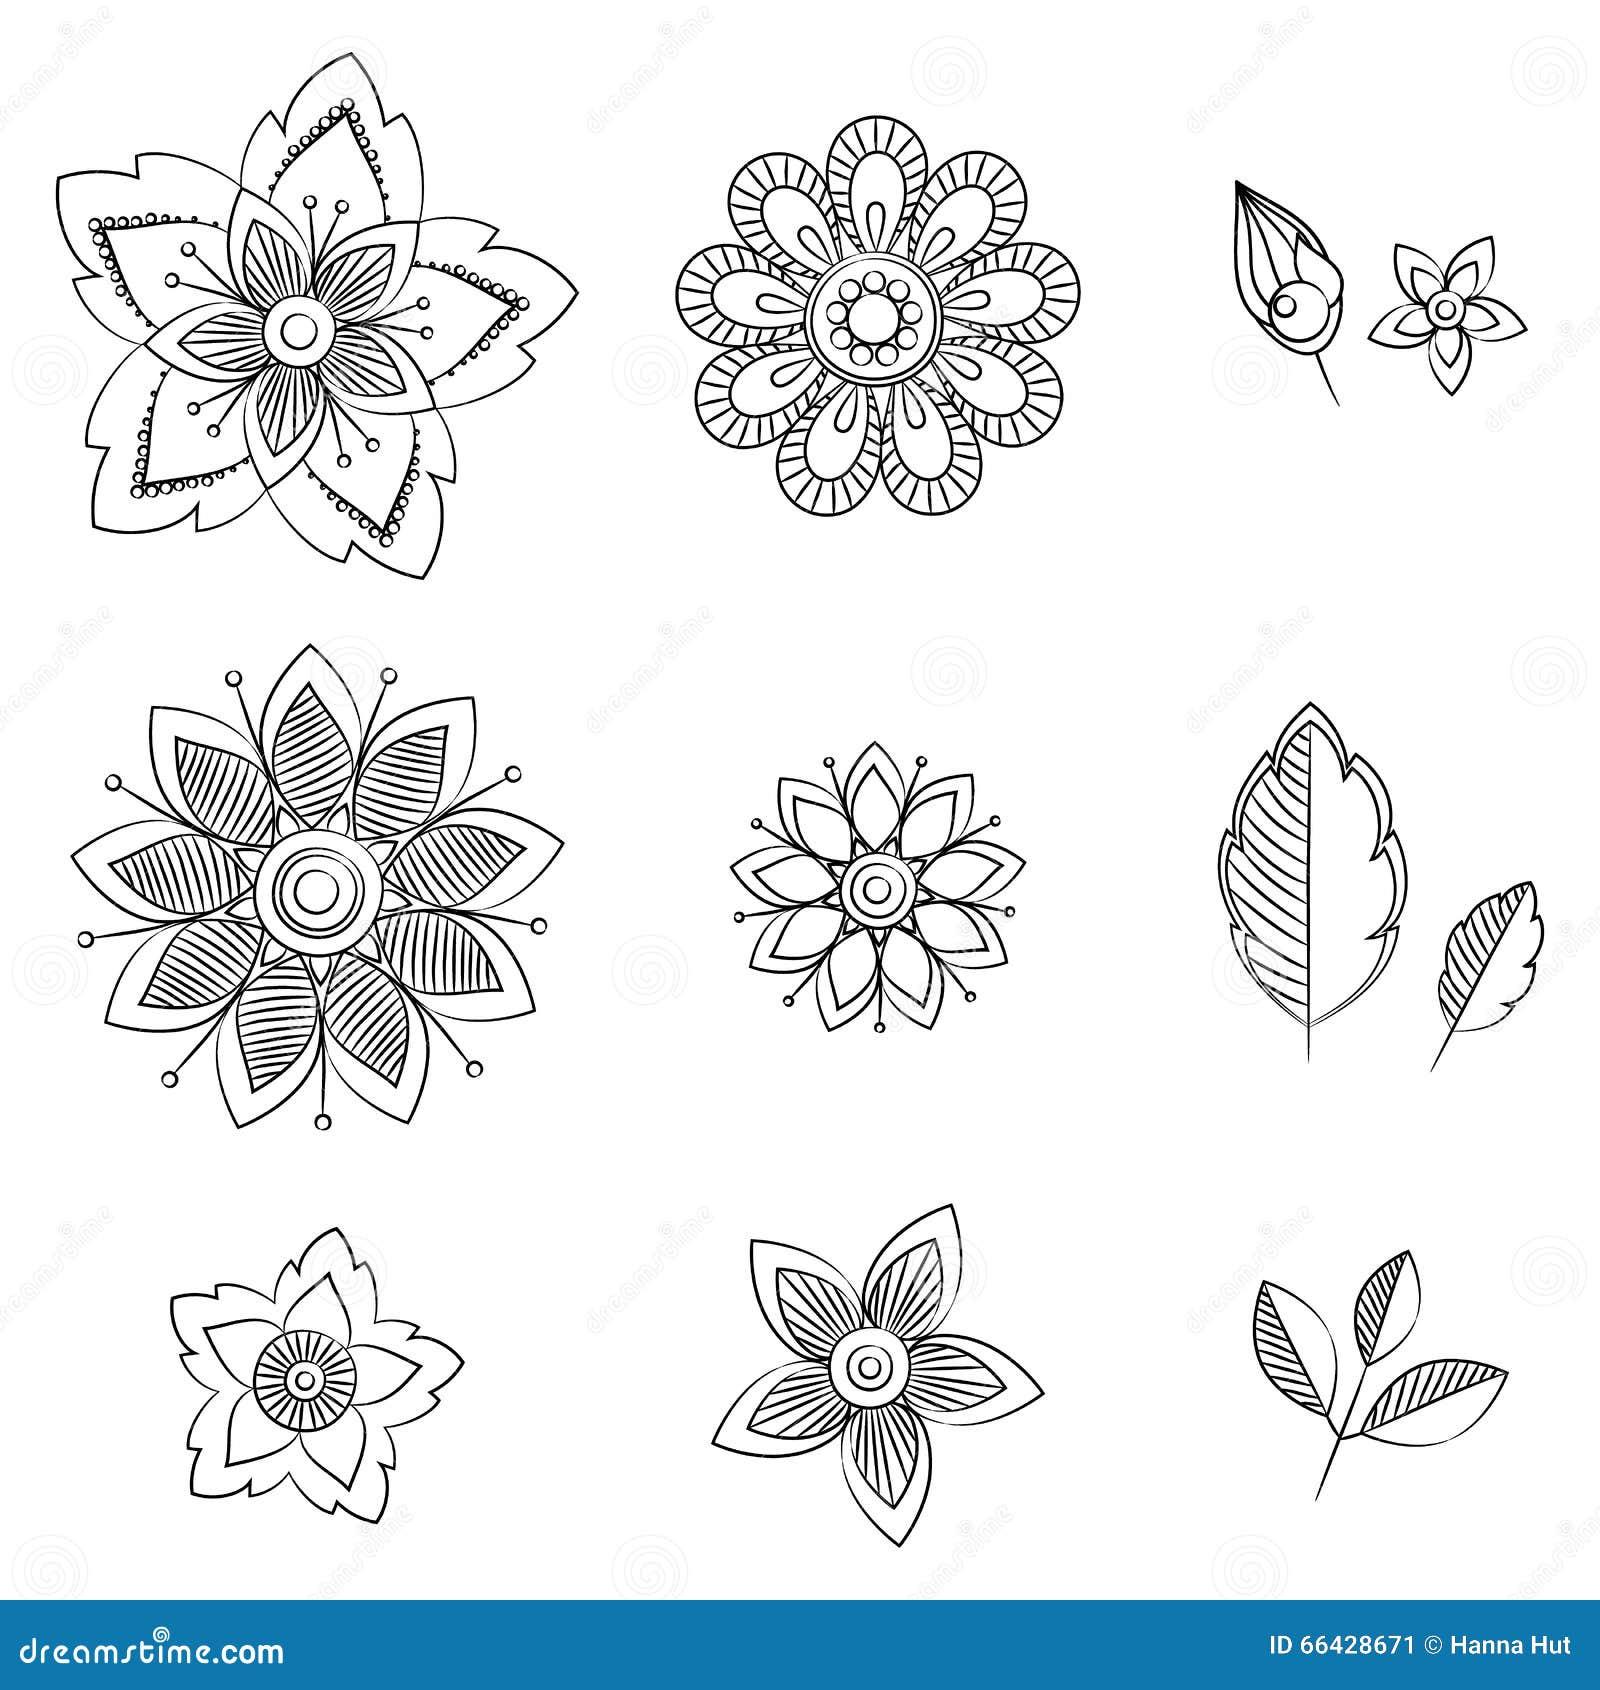 Doodle Art Flowers Hand Drawn Herbal Design Elements Stock Vector